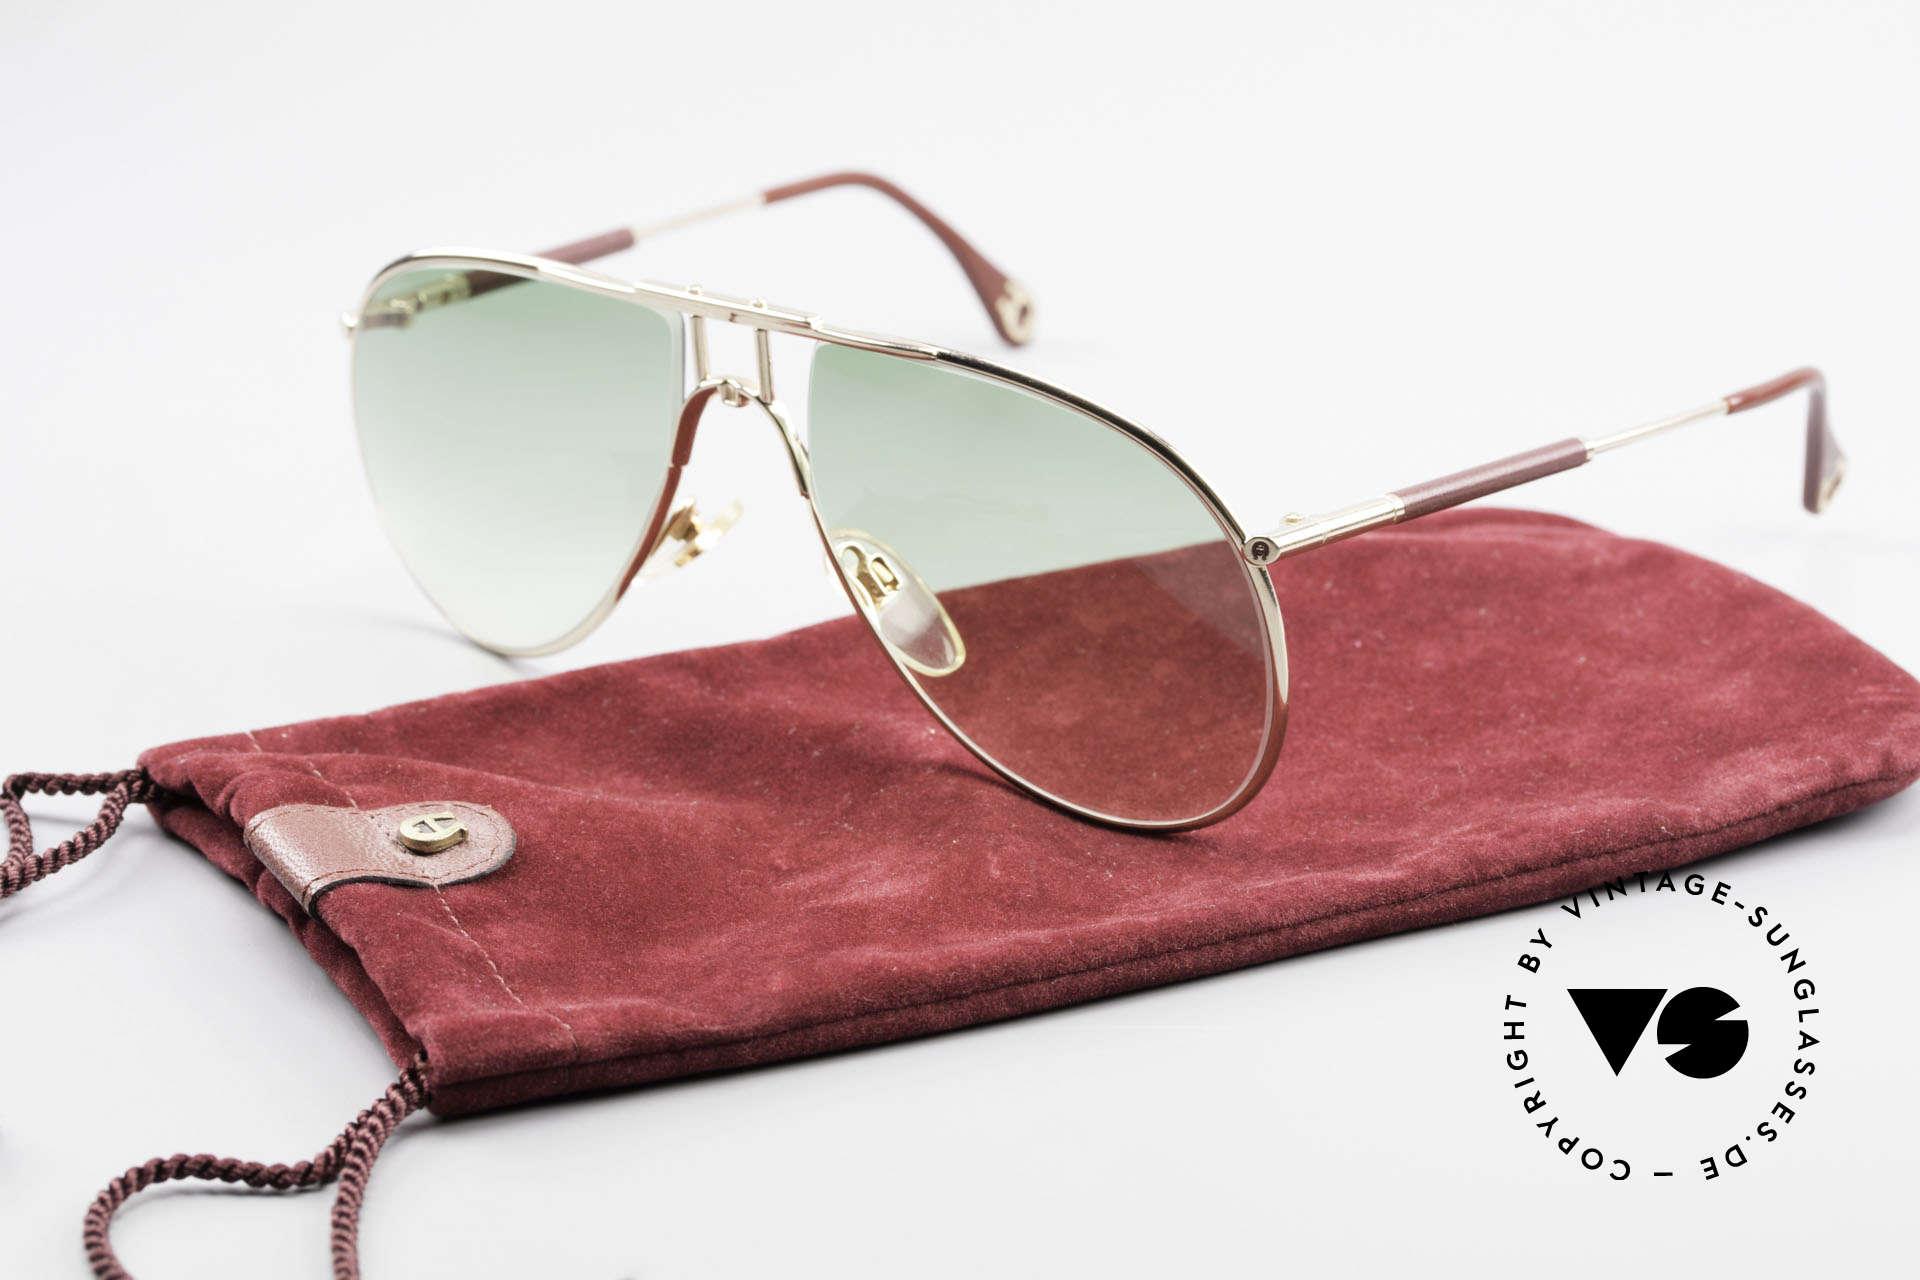 Aigner EA3 Rare 80's Vintage Sunglasses, Size: medium, Made for Men